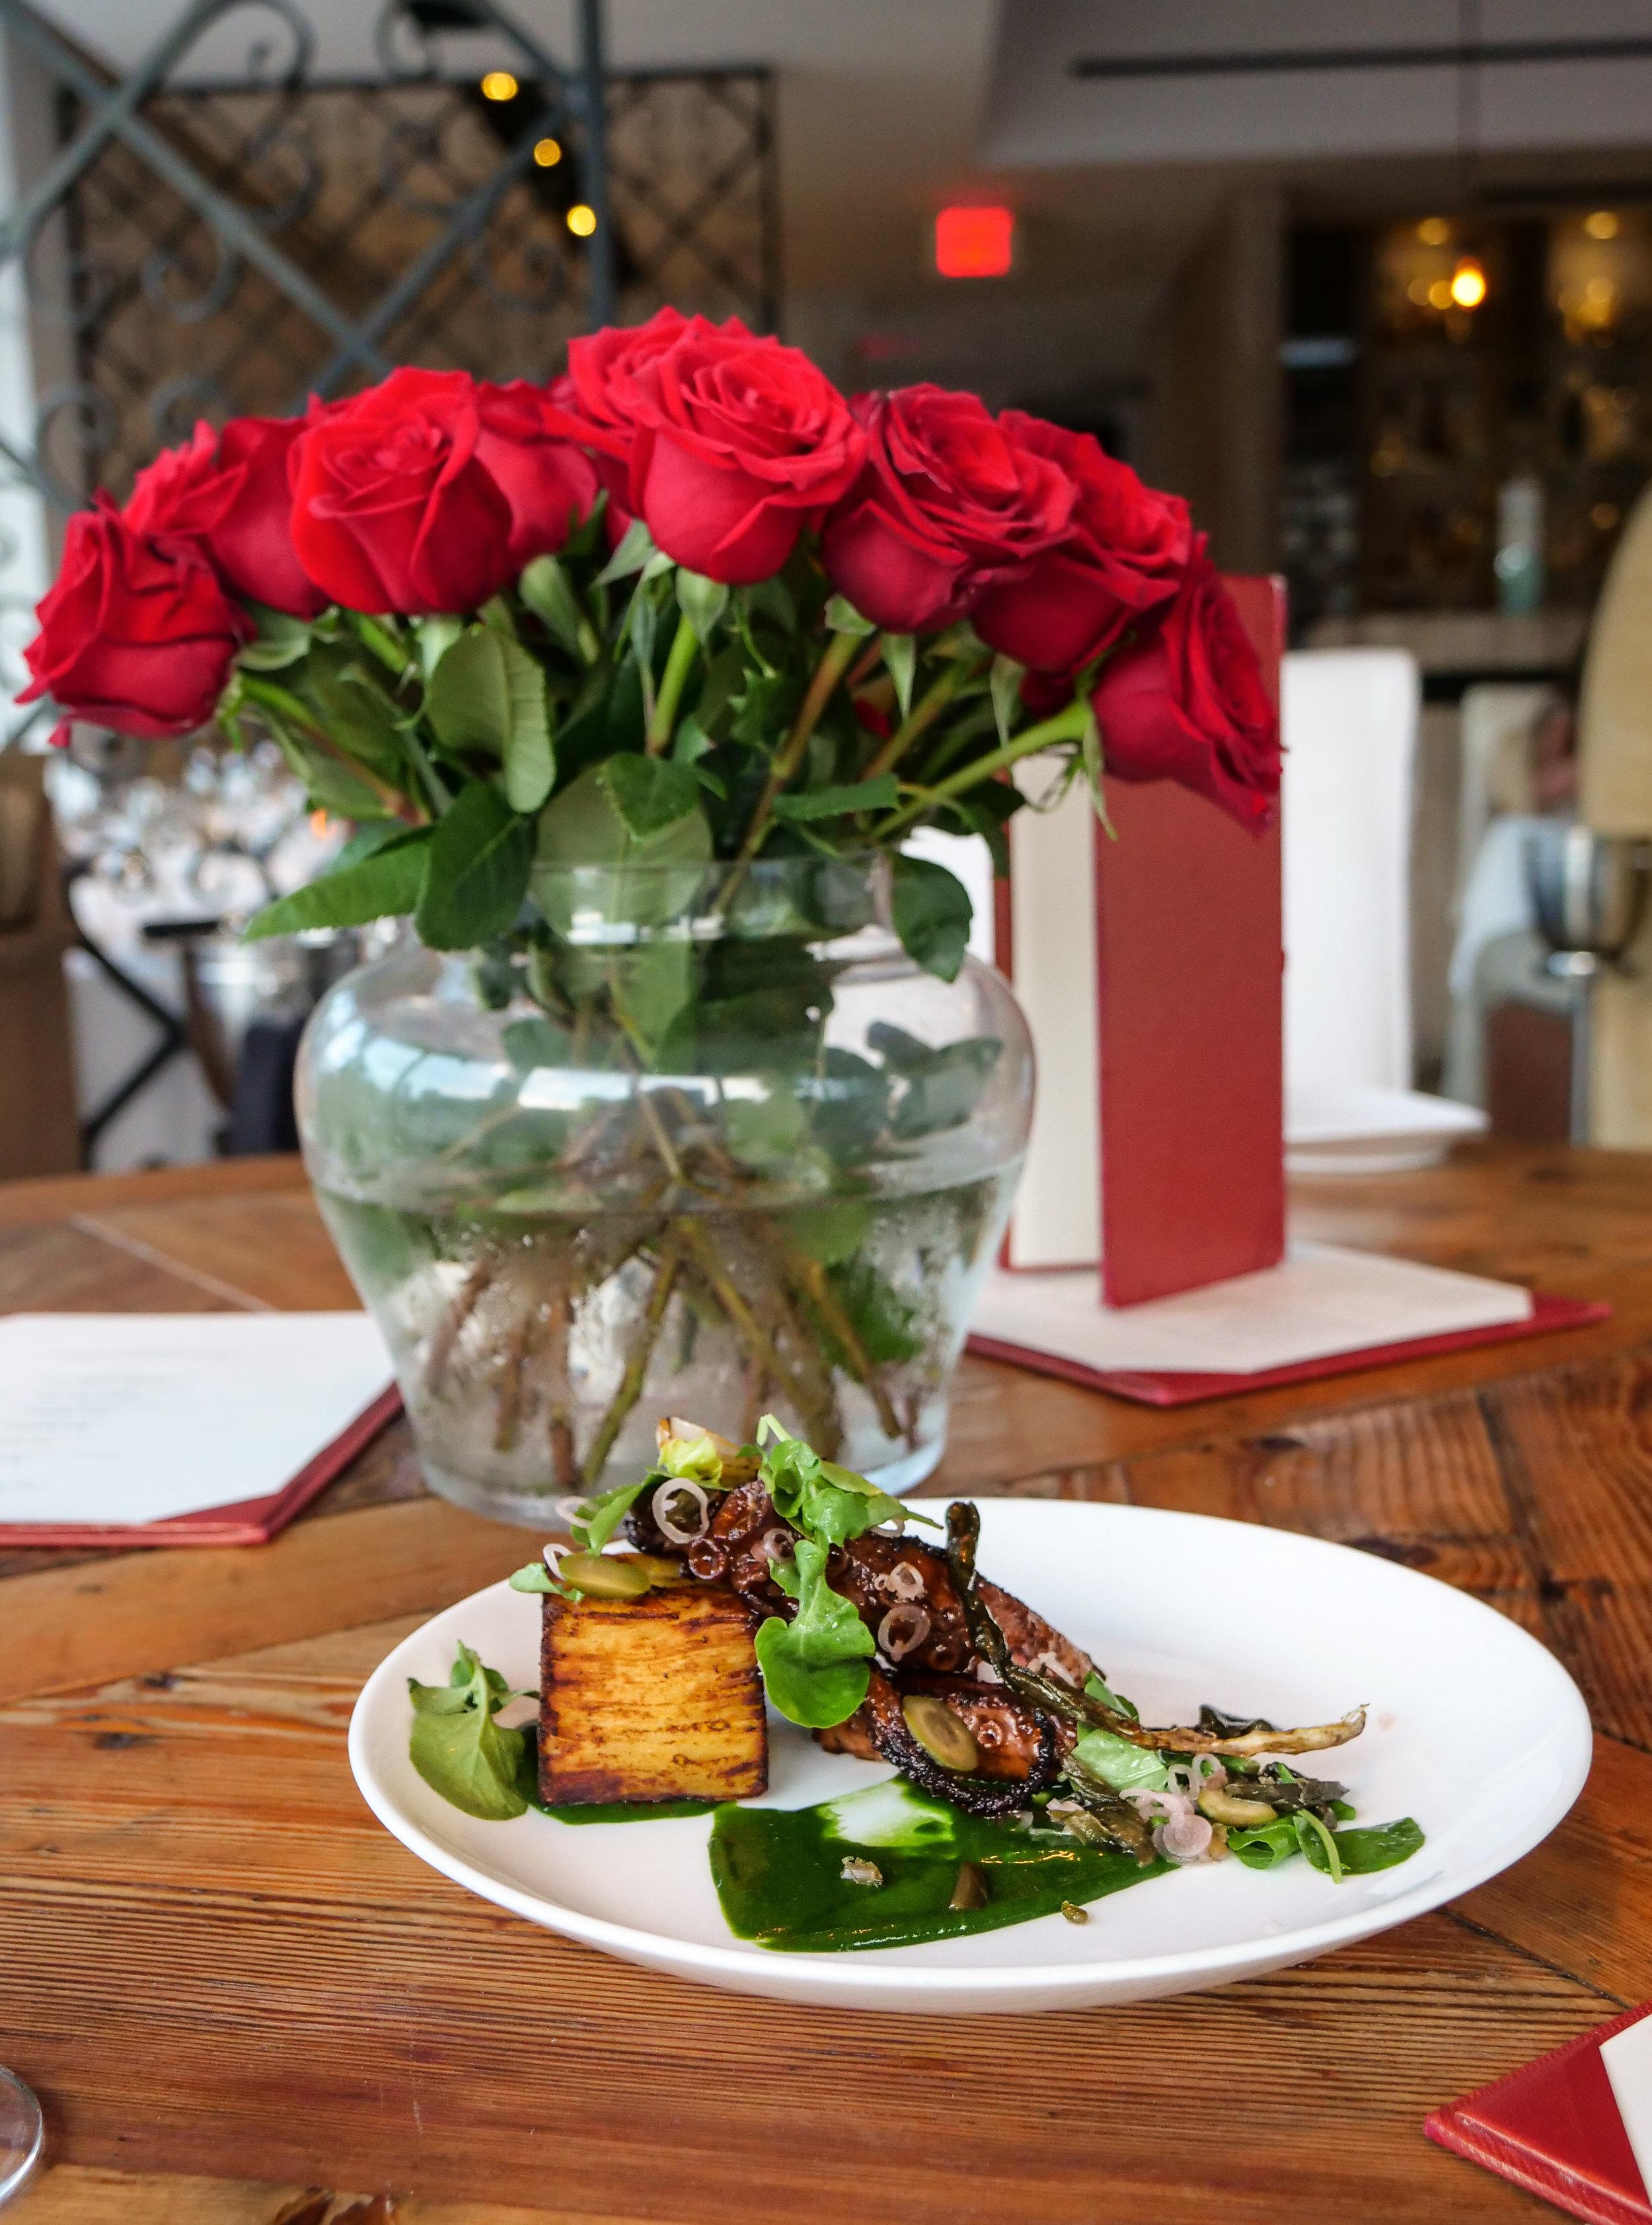 SarahFunky Fort lauderdale Culinary-15.jpg